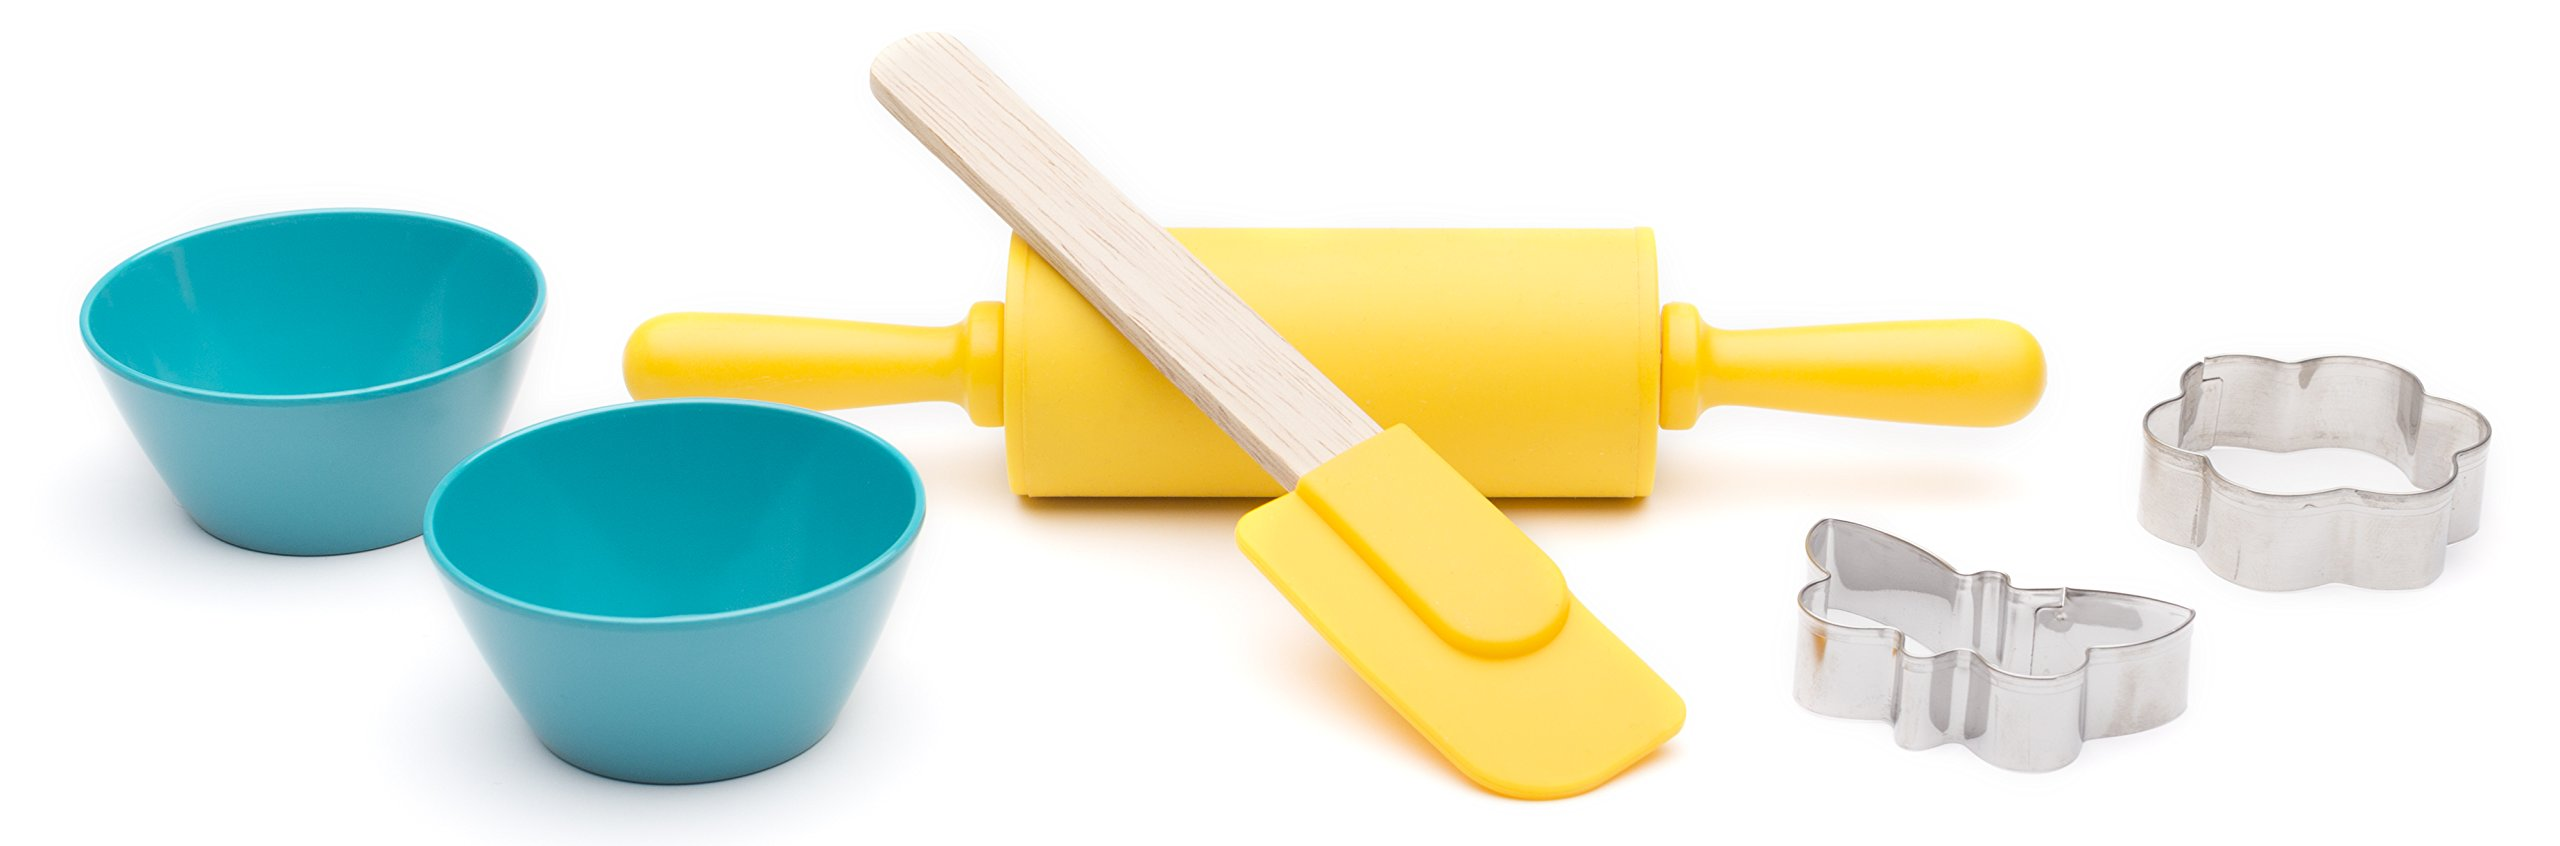 Zak Design Tiny Chef 6-Piece Kids Baking & Activity Set For Baking Cookies, Flower & Butterfly Design